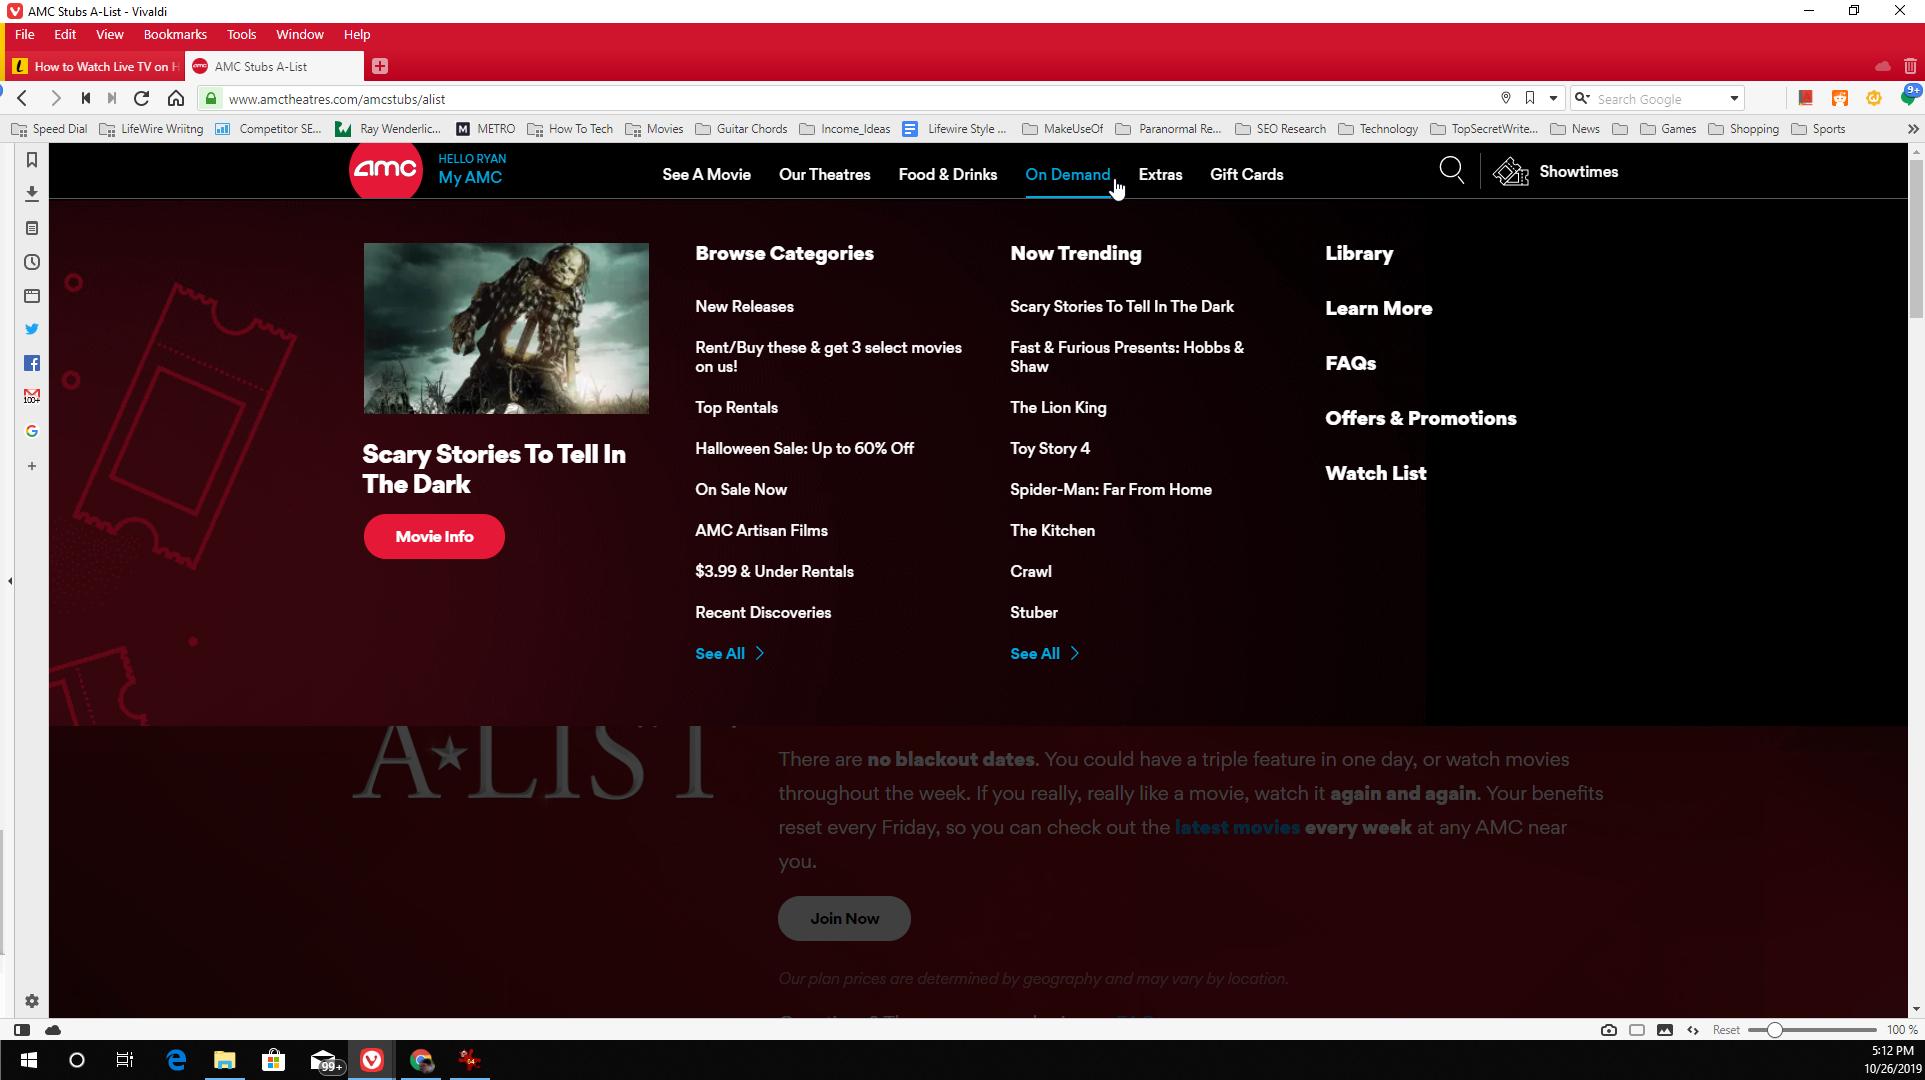 Screenshot of My AMC account On Demand menu